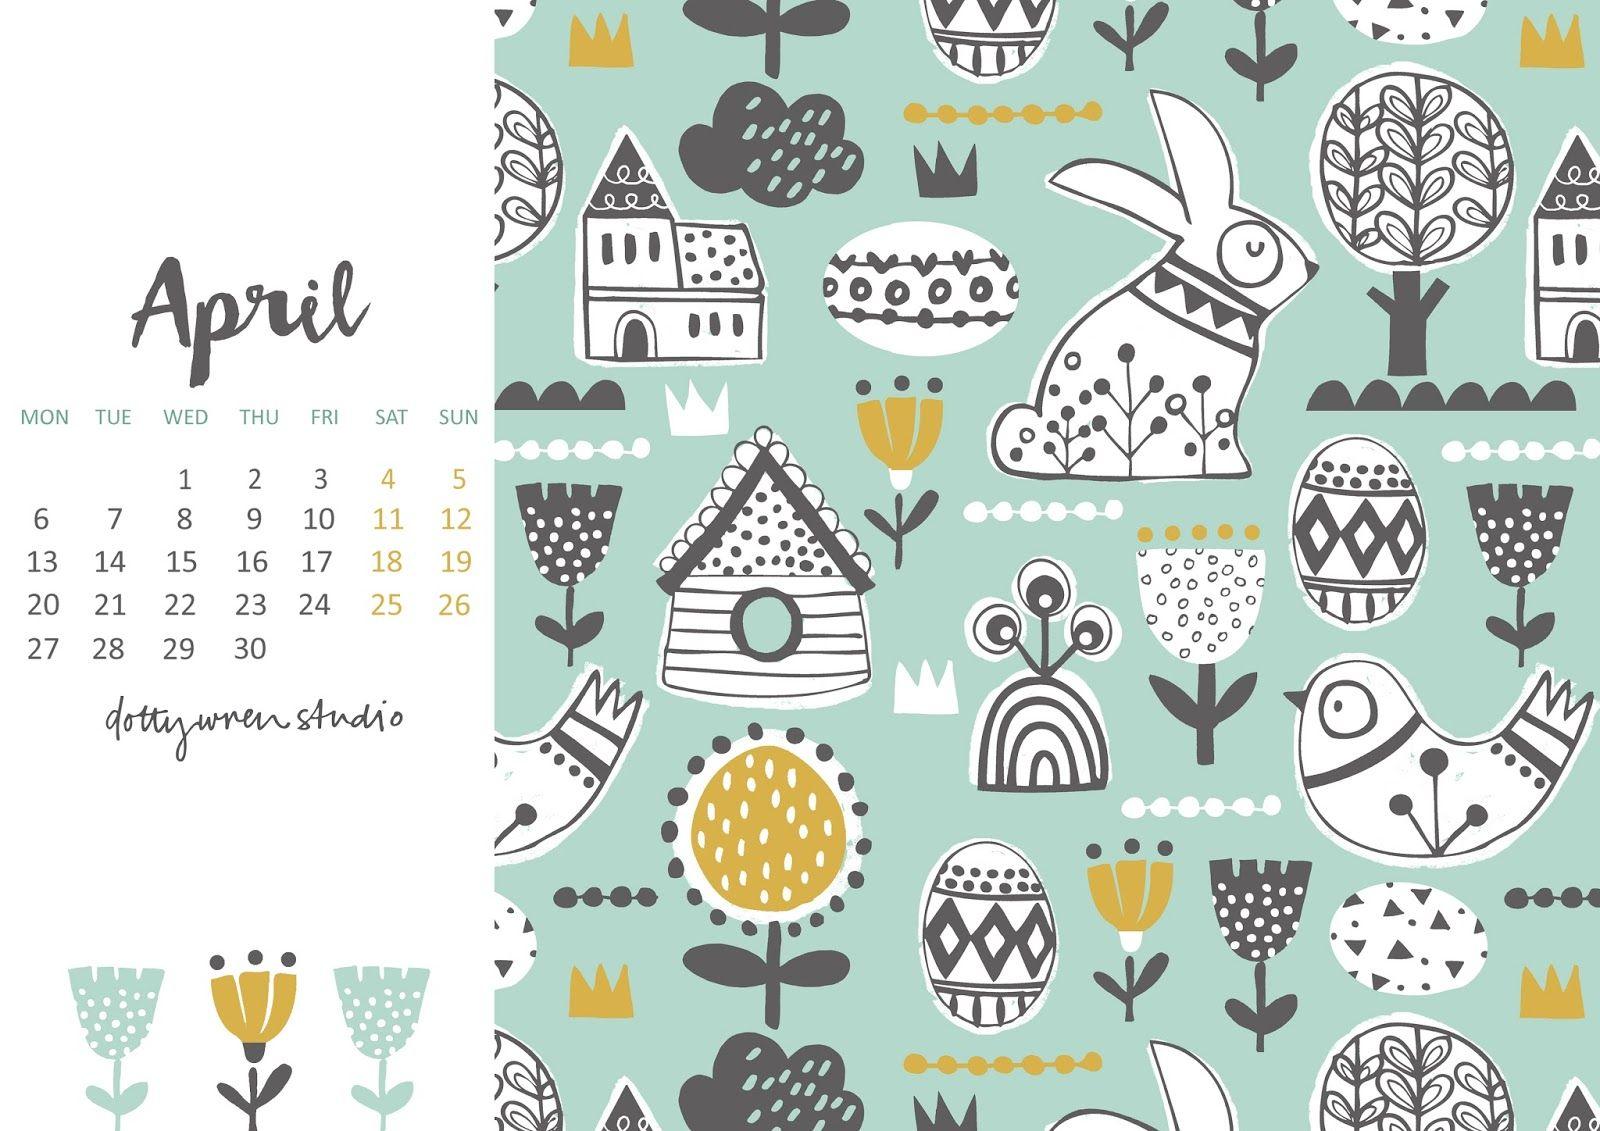 April Dates Free Poster Printables Free Printable Calendar Free Printables